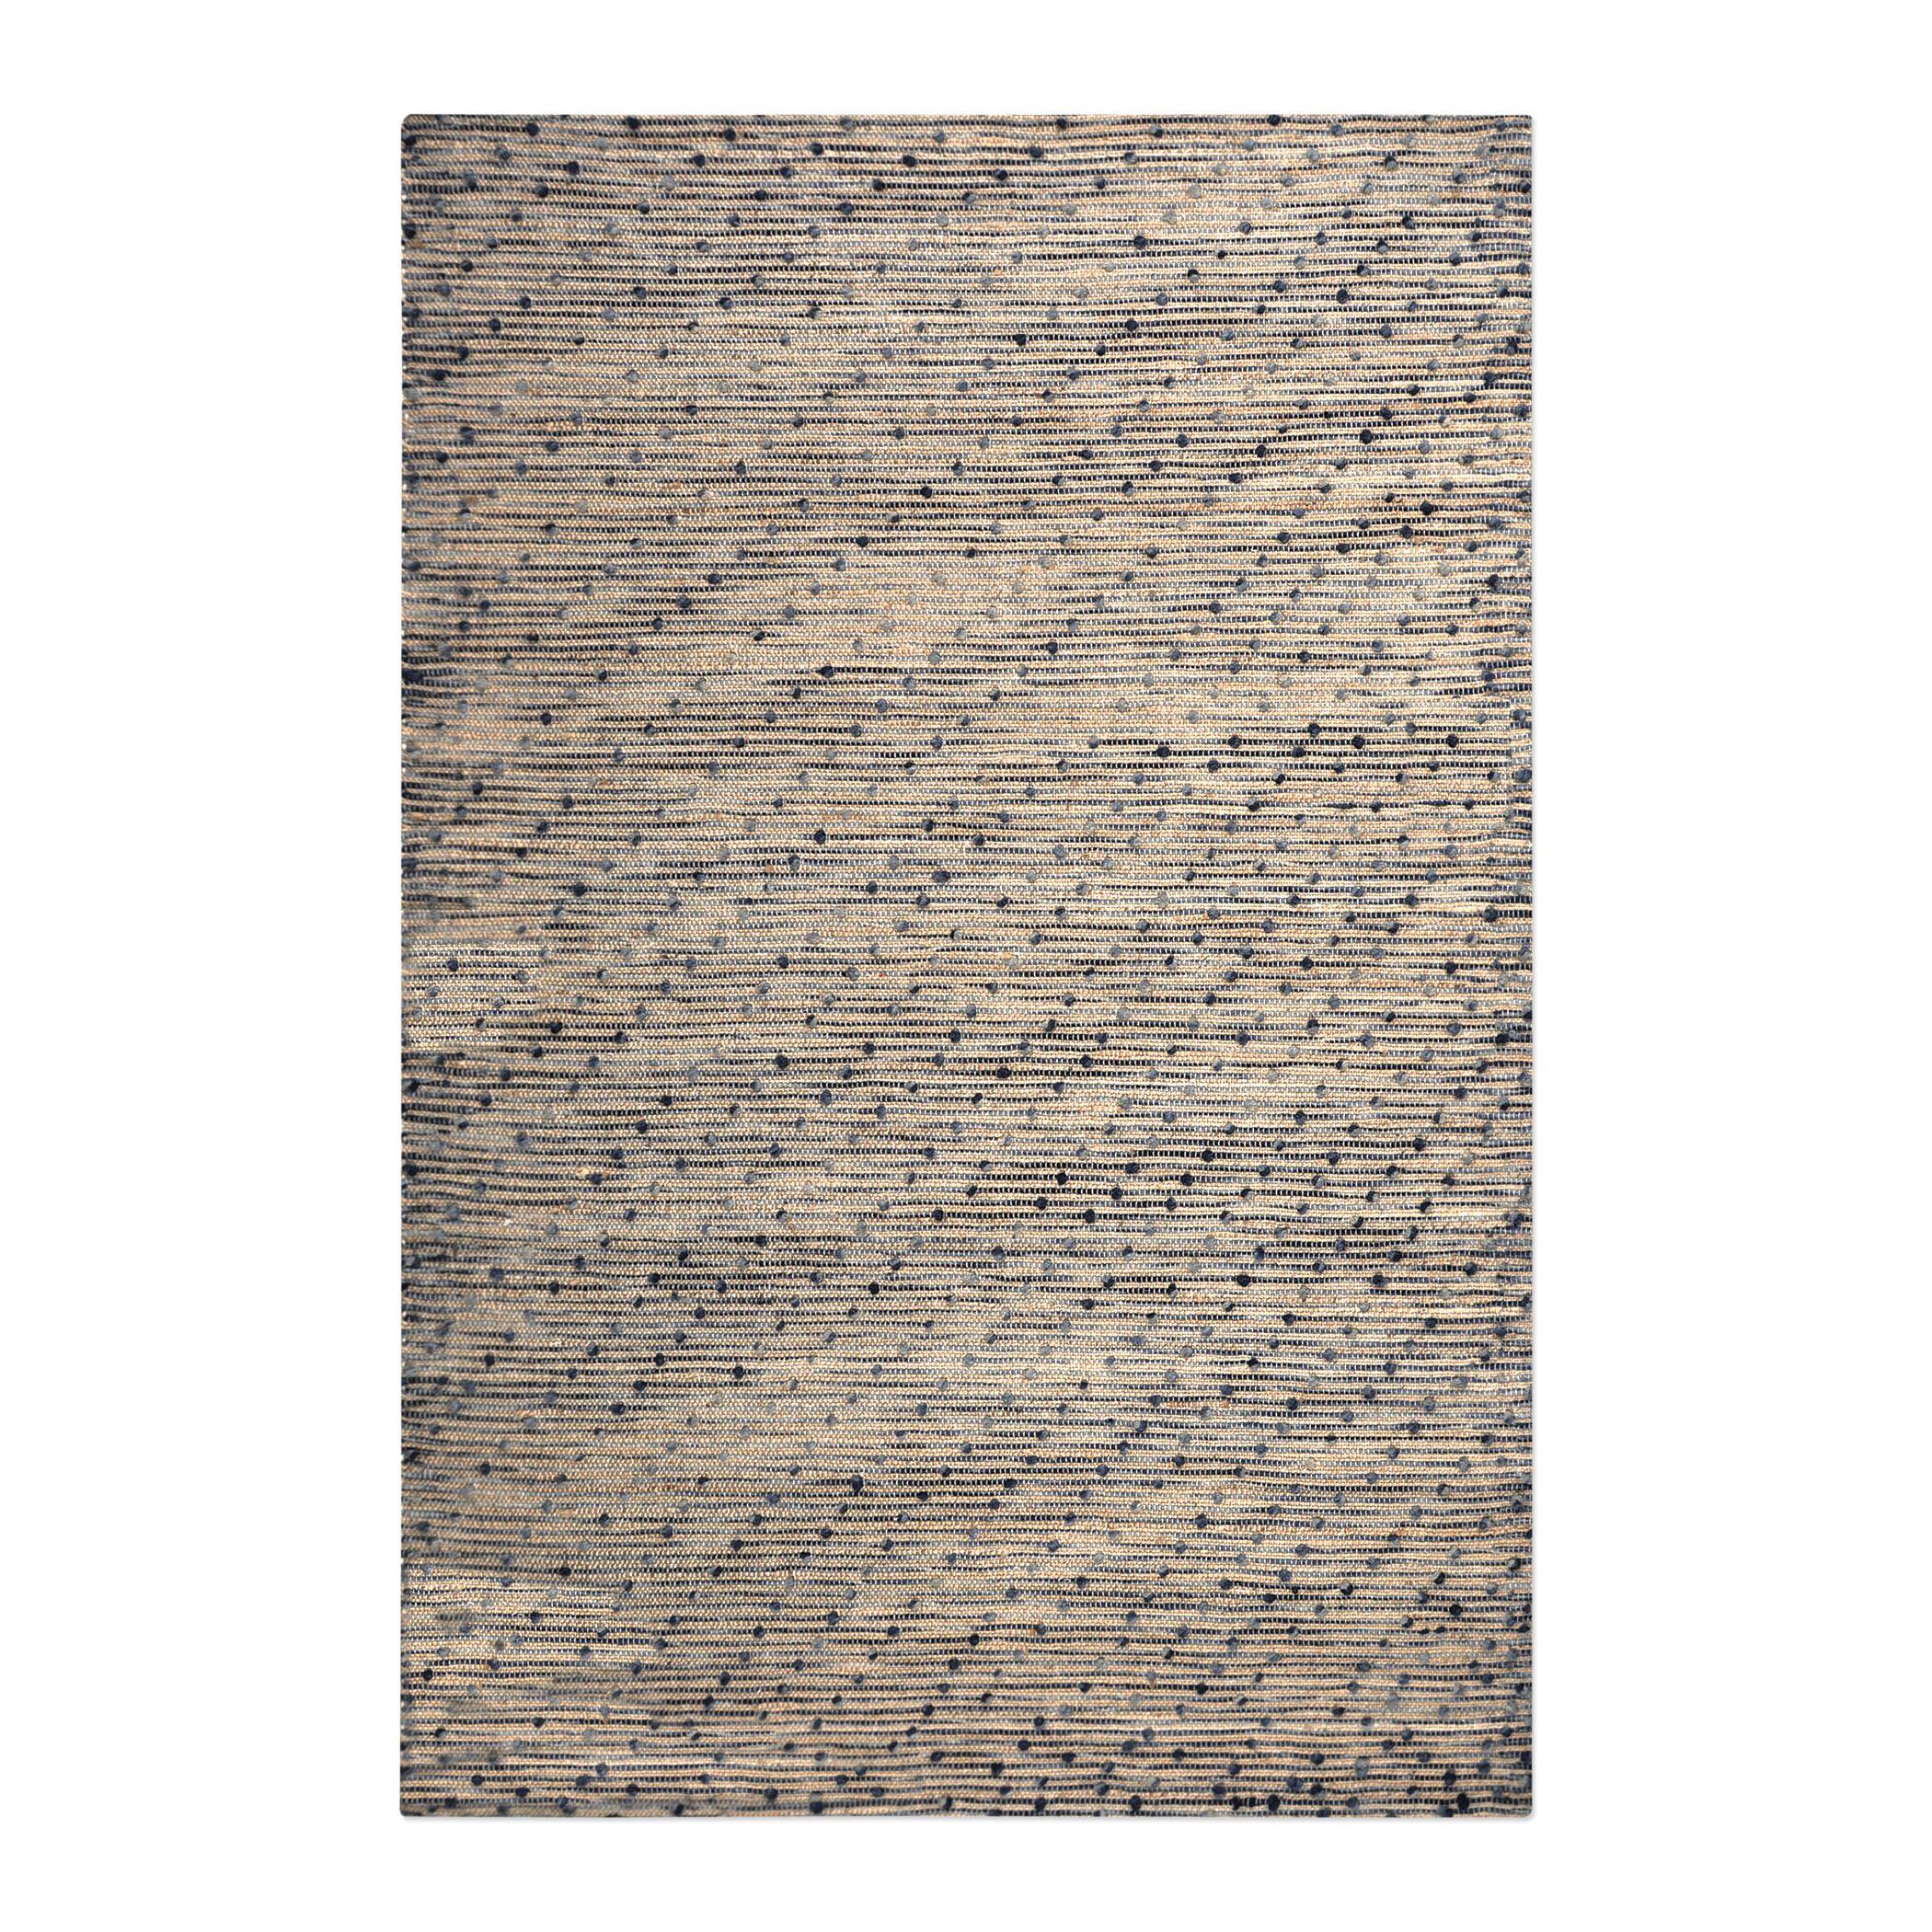 Dighton Hand-Woven Wool Beige/Navy Area Rug Rug Size: 5' x 8'